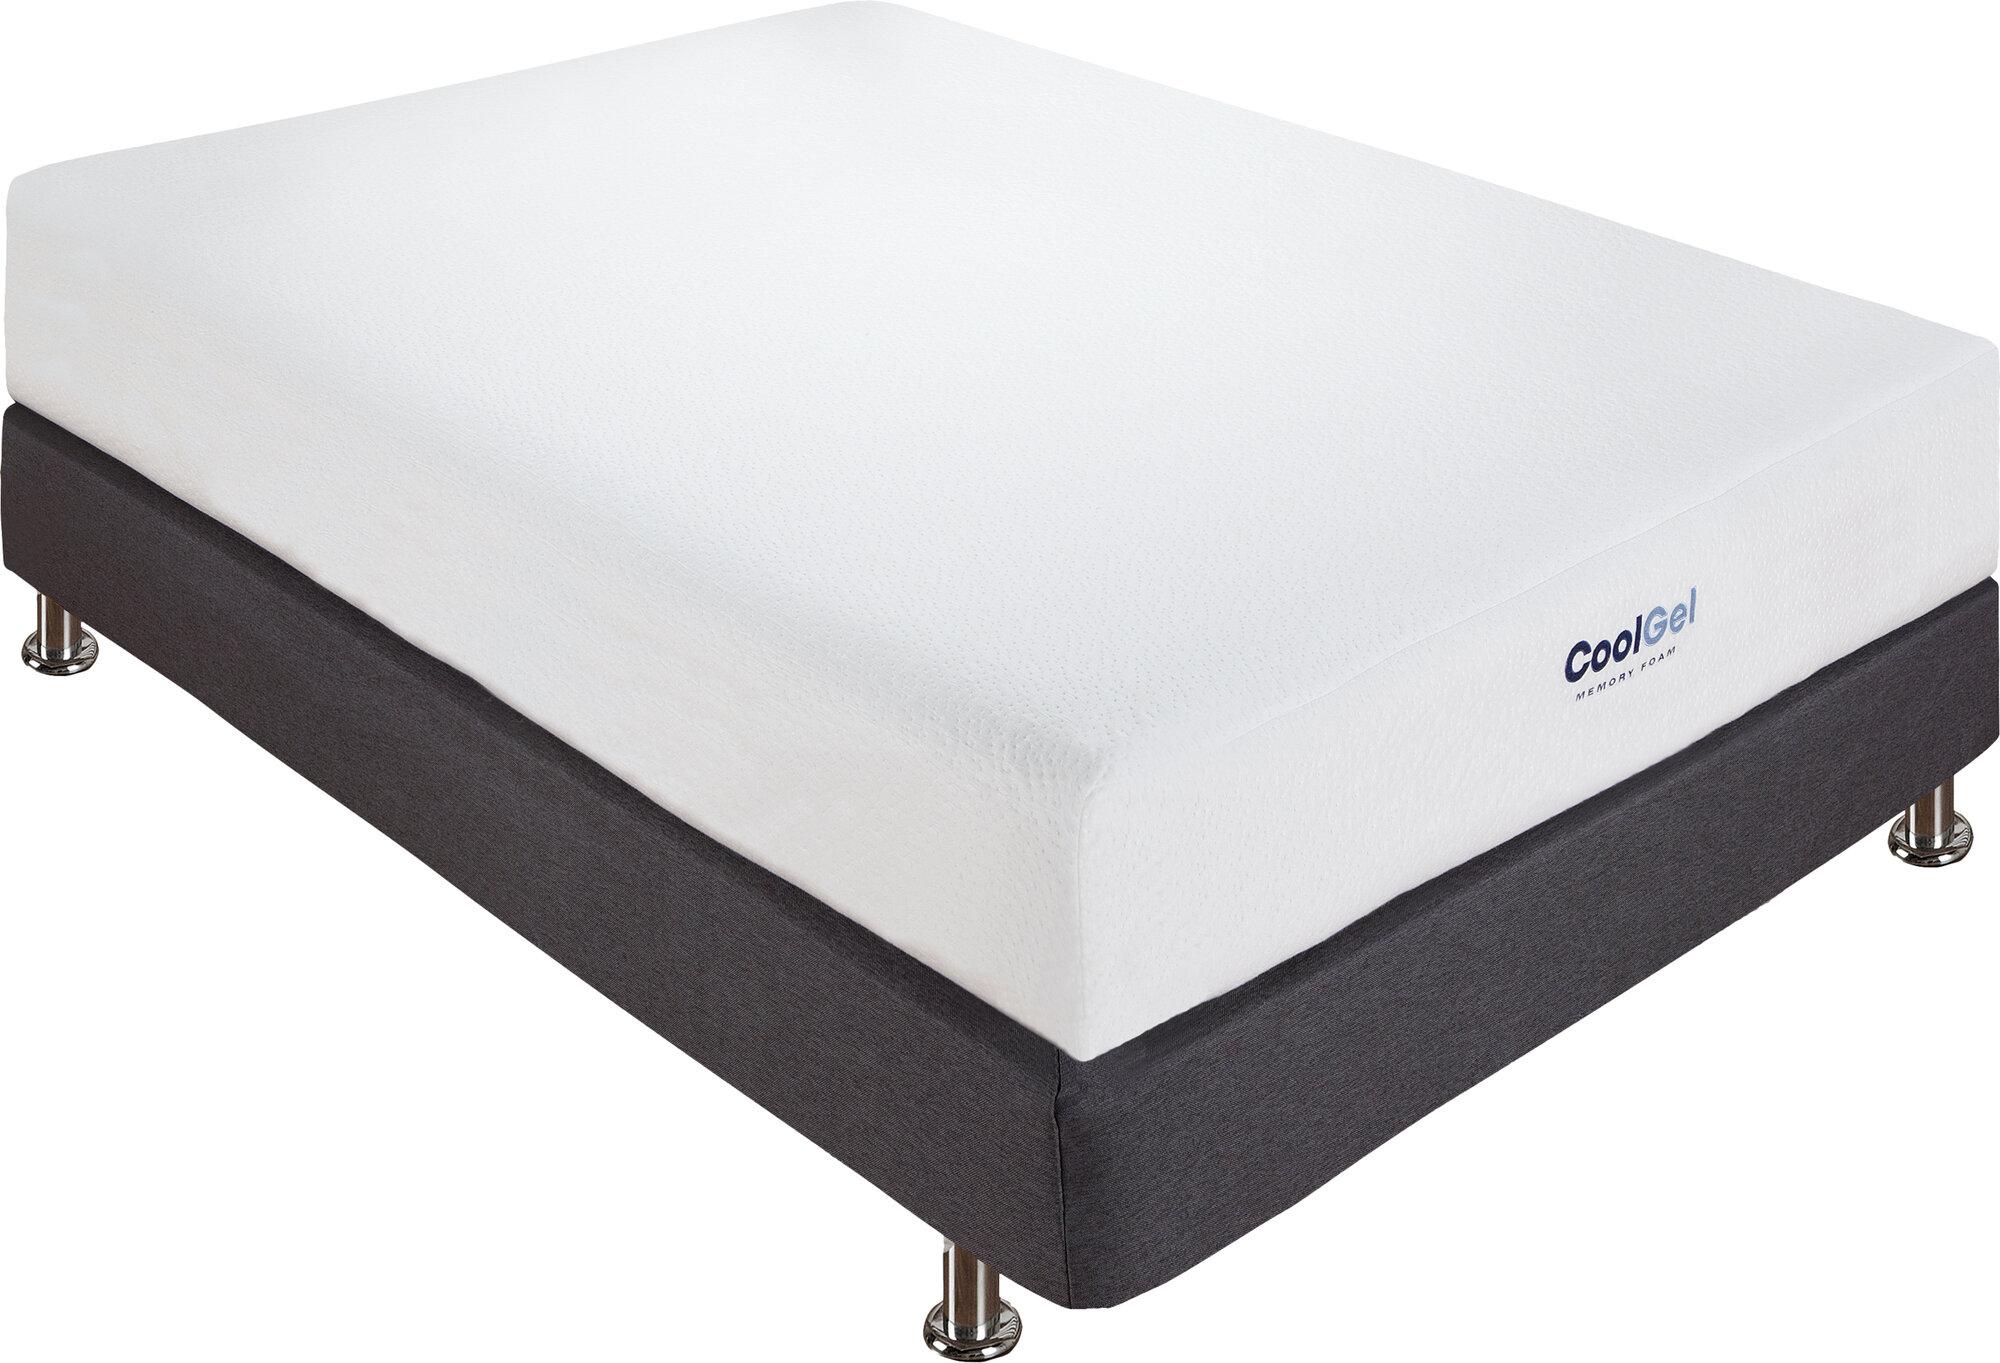 alwyn home 8 firm gel memory foam mattress ebay. Black Bedroom Furniture Sets. Home Design Ideas